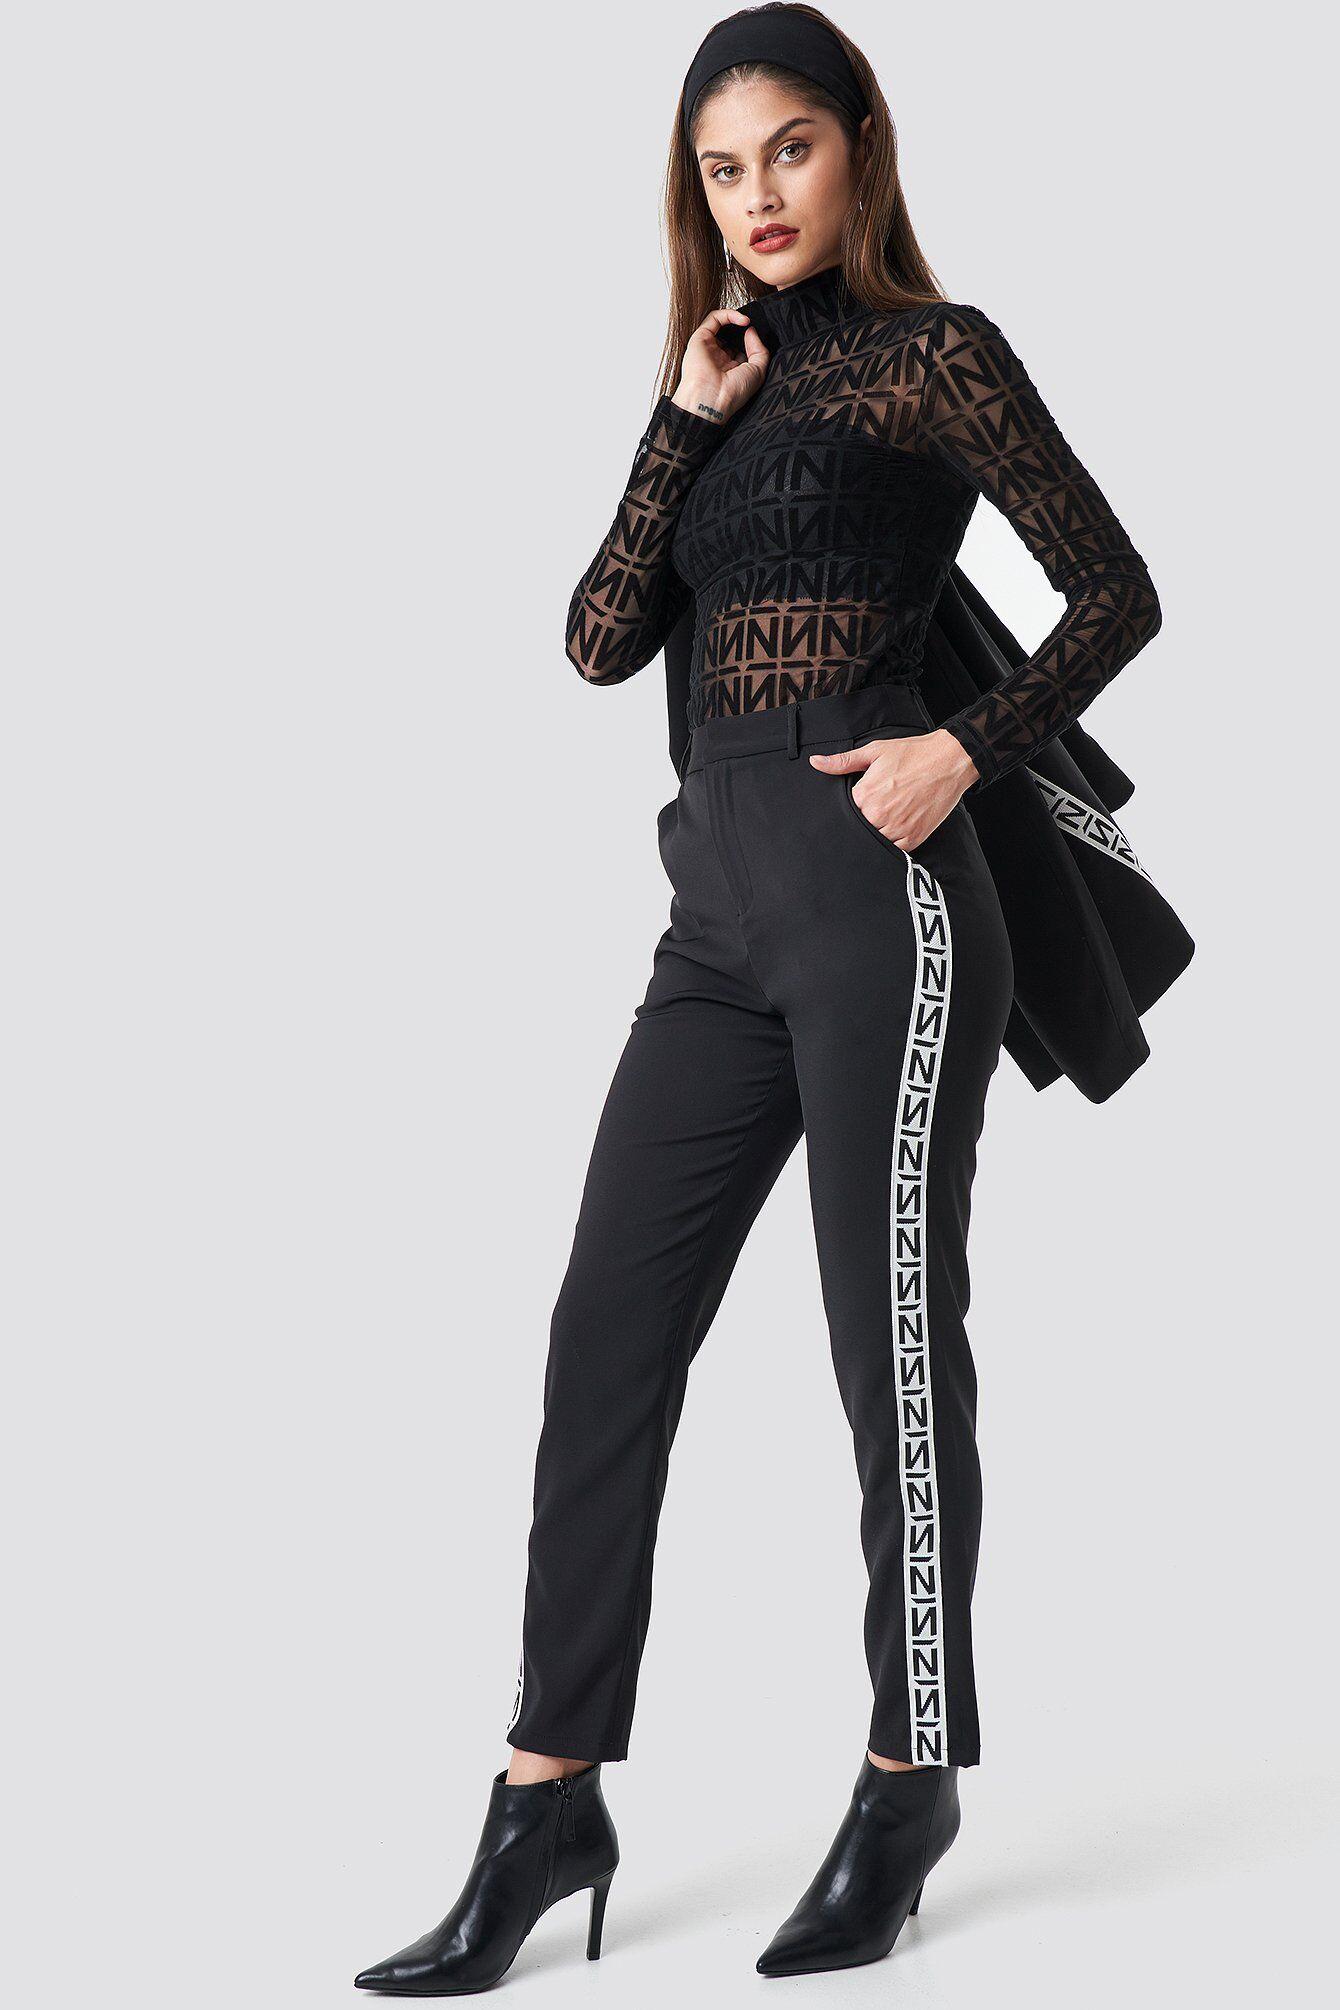 NA-KD Trend N Branded Suit Pants - Black  - Size: EU 32,EU 34,EU 36,EU 38,EU 40,EU 42,EU 44